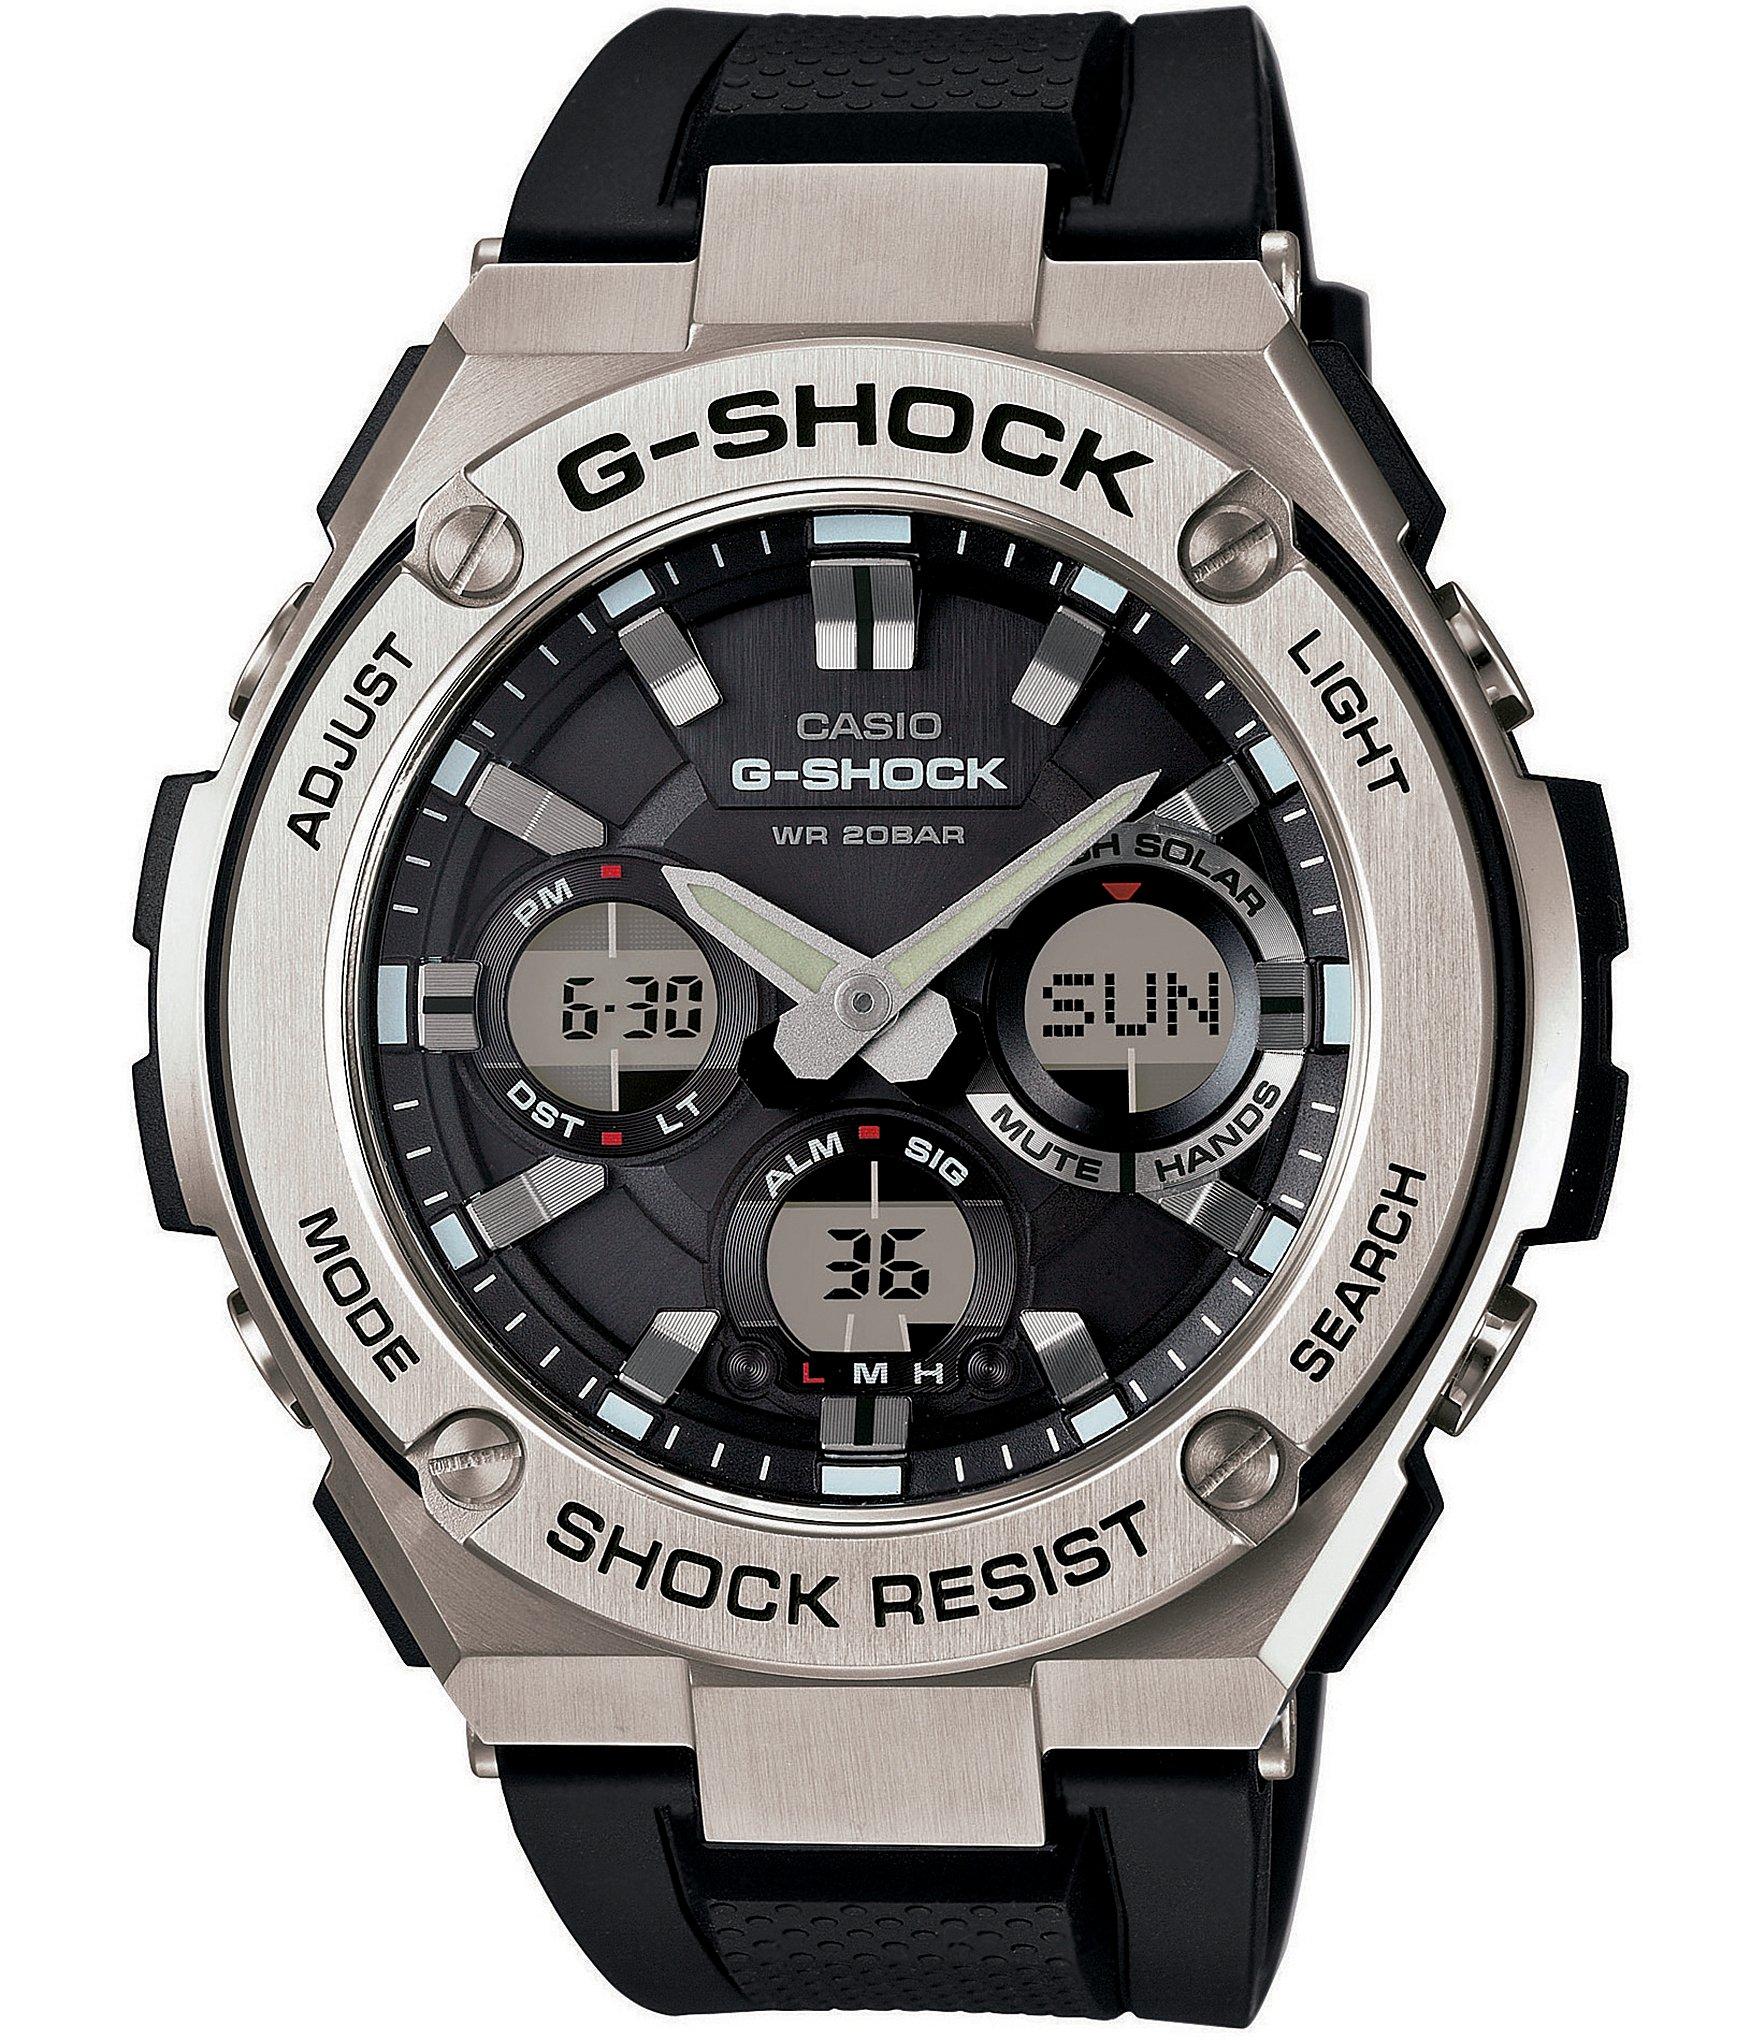 74d3022dc138e G-Shock Men s Watches